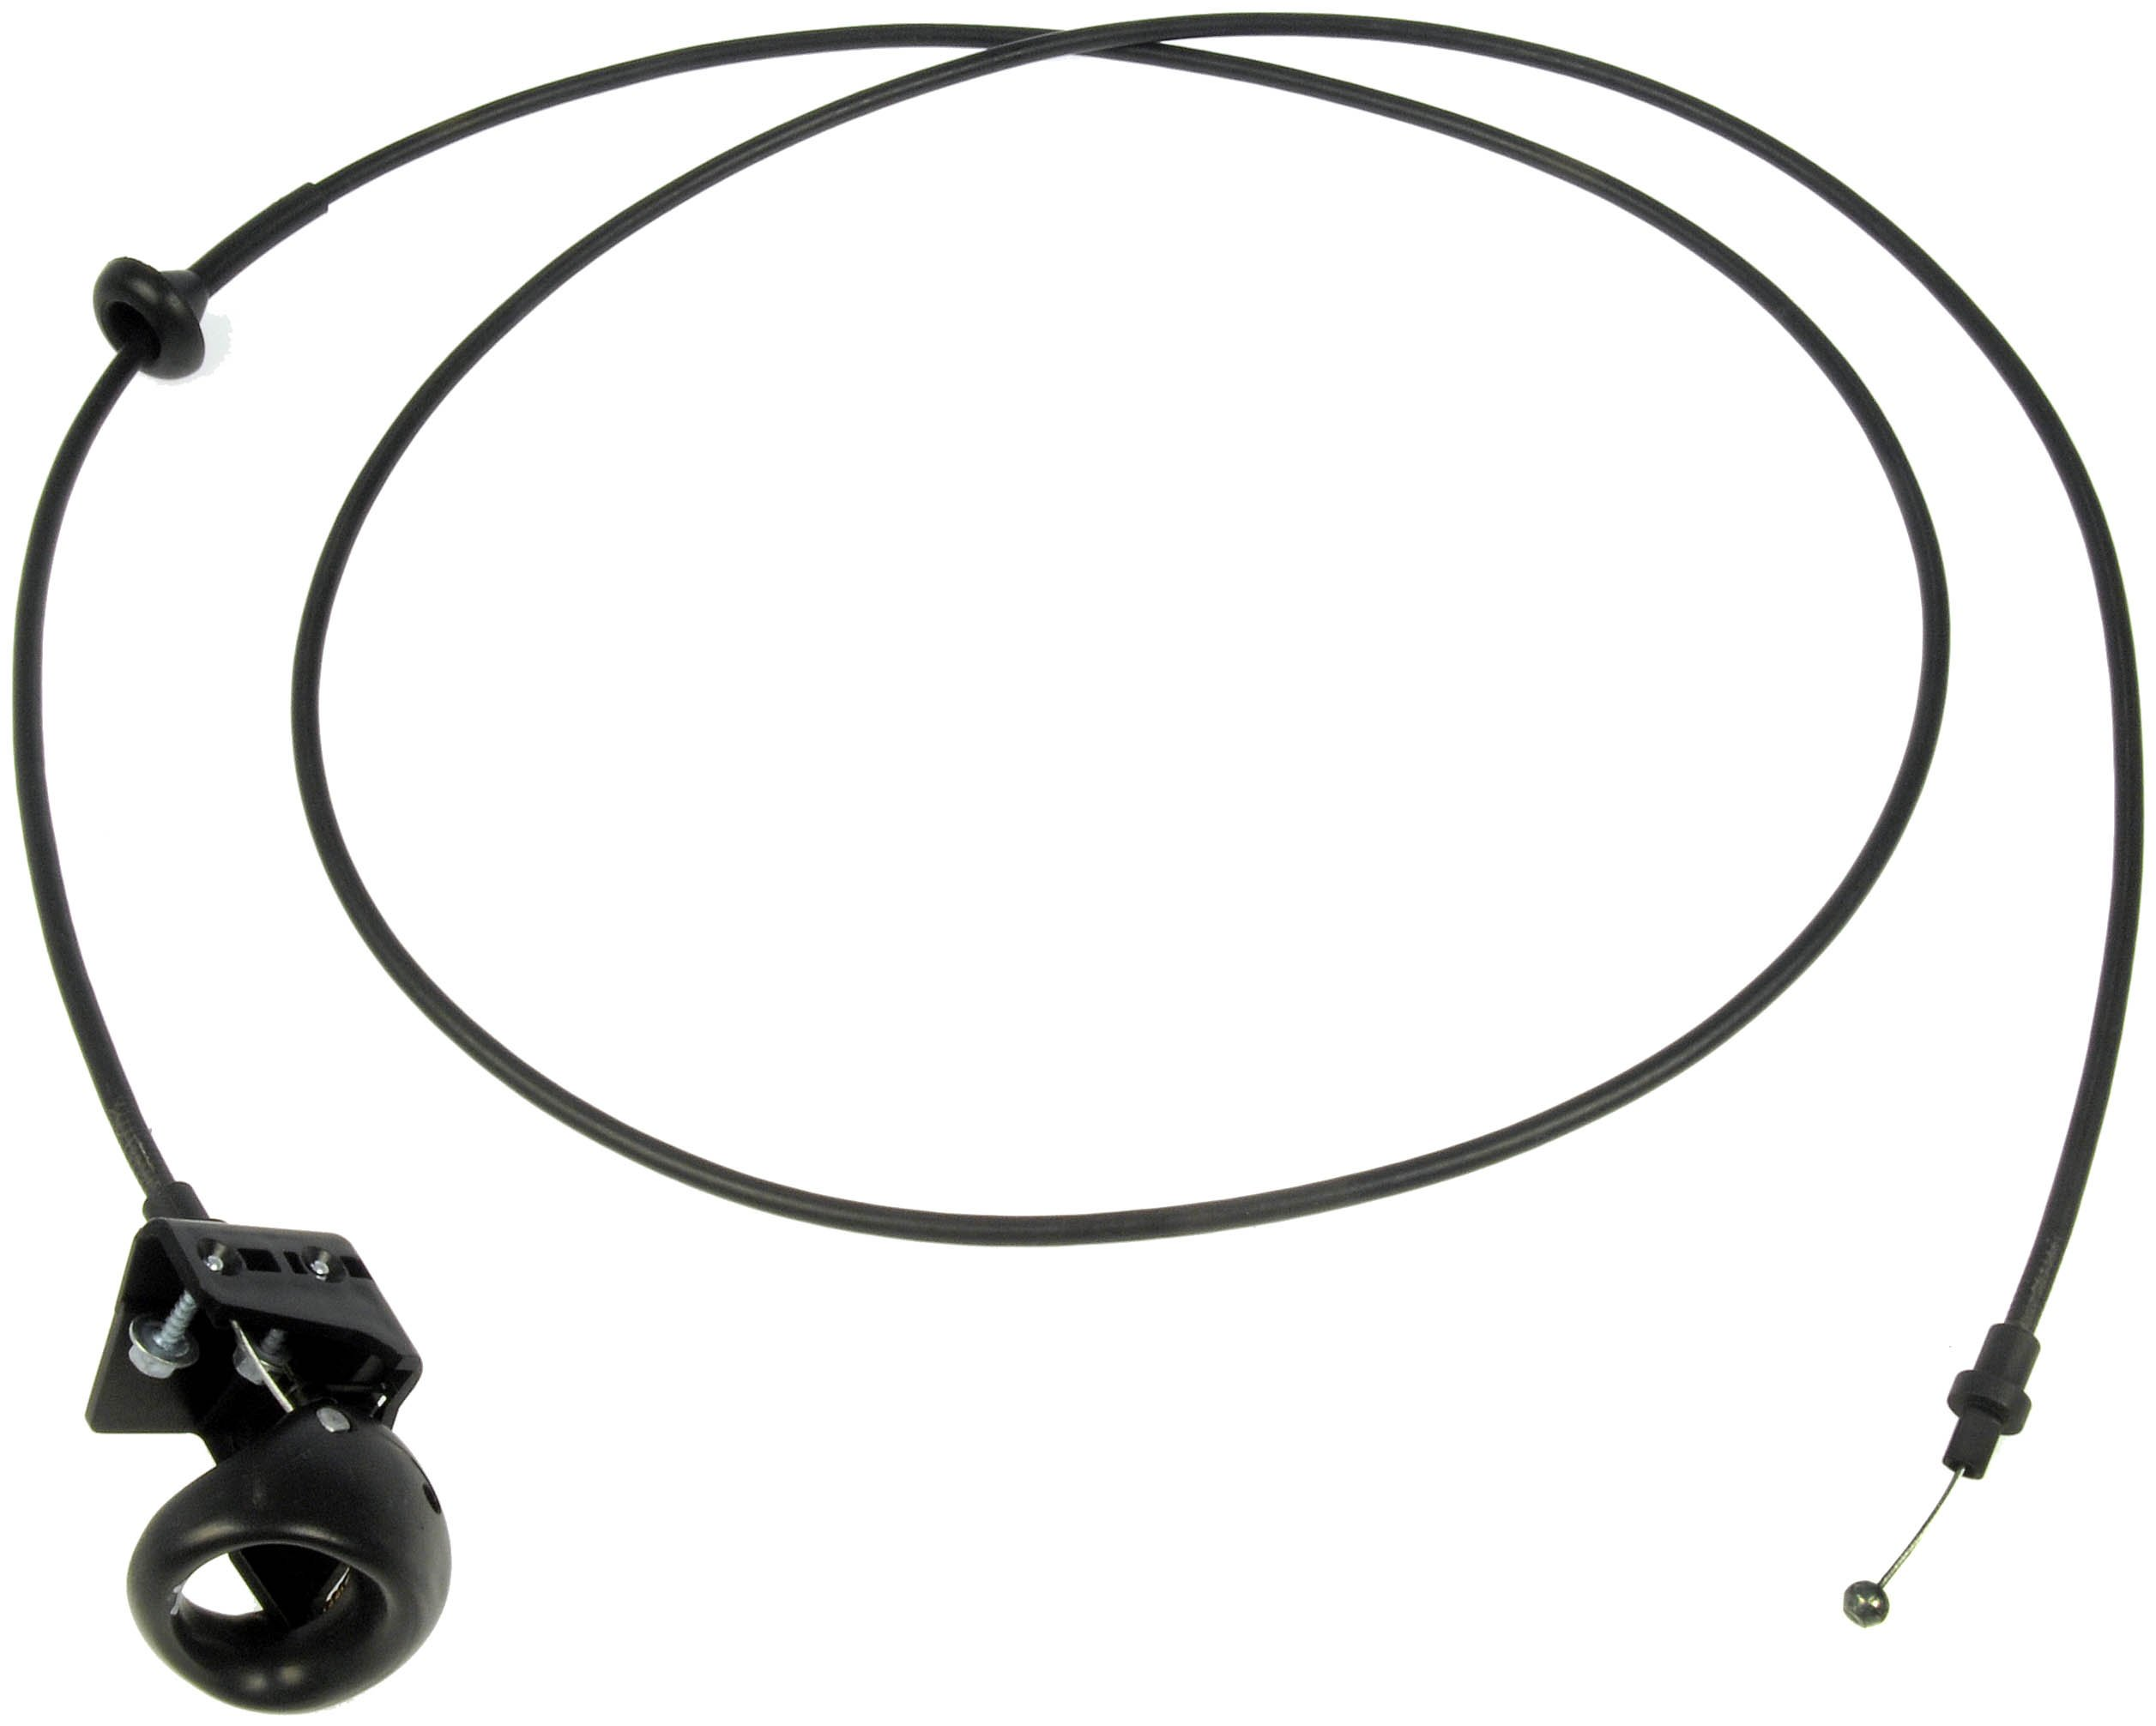 Dorman 912-047 Hood Release Cable